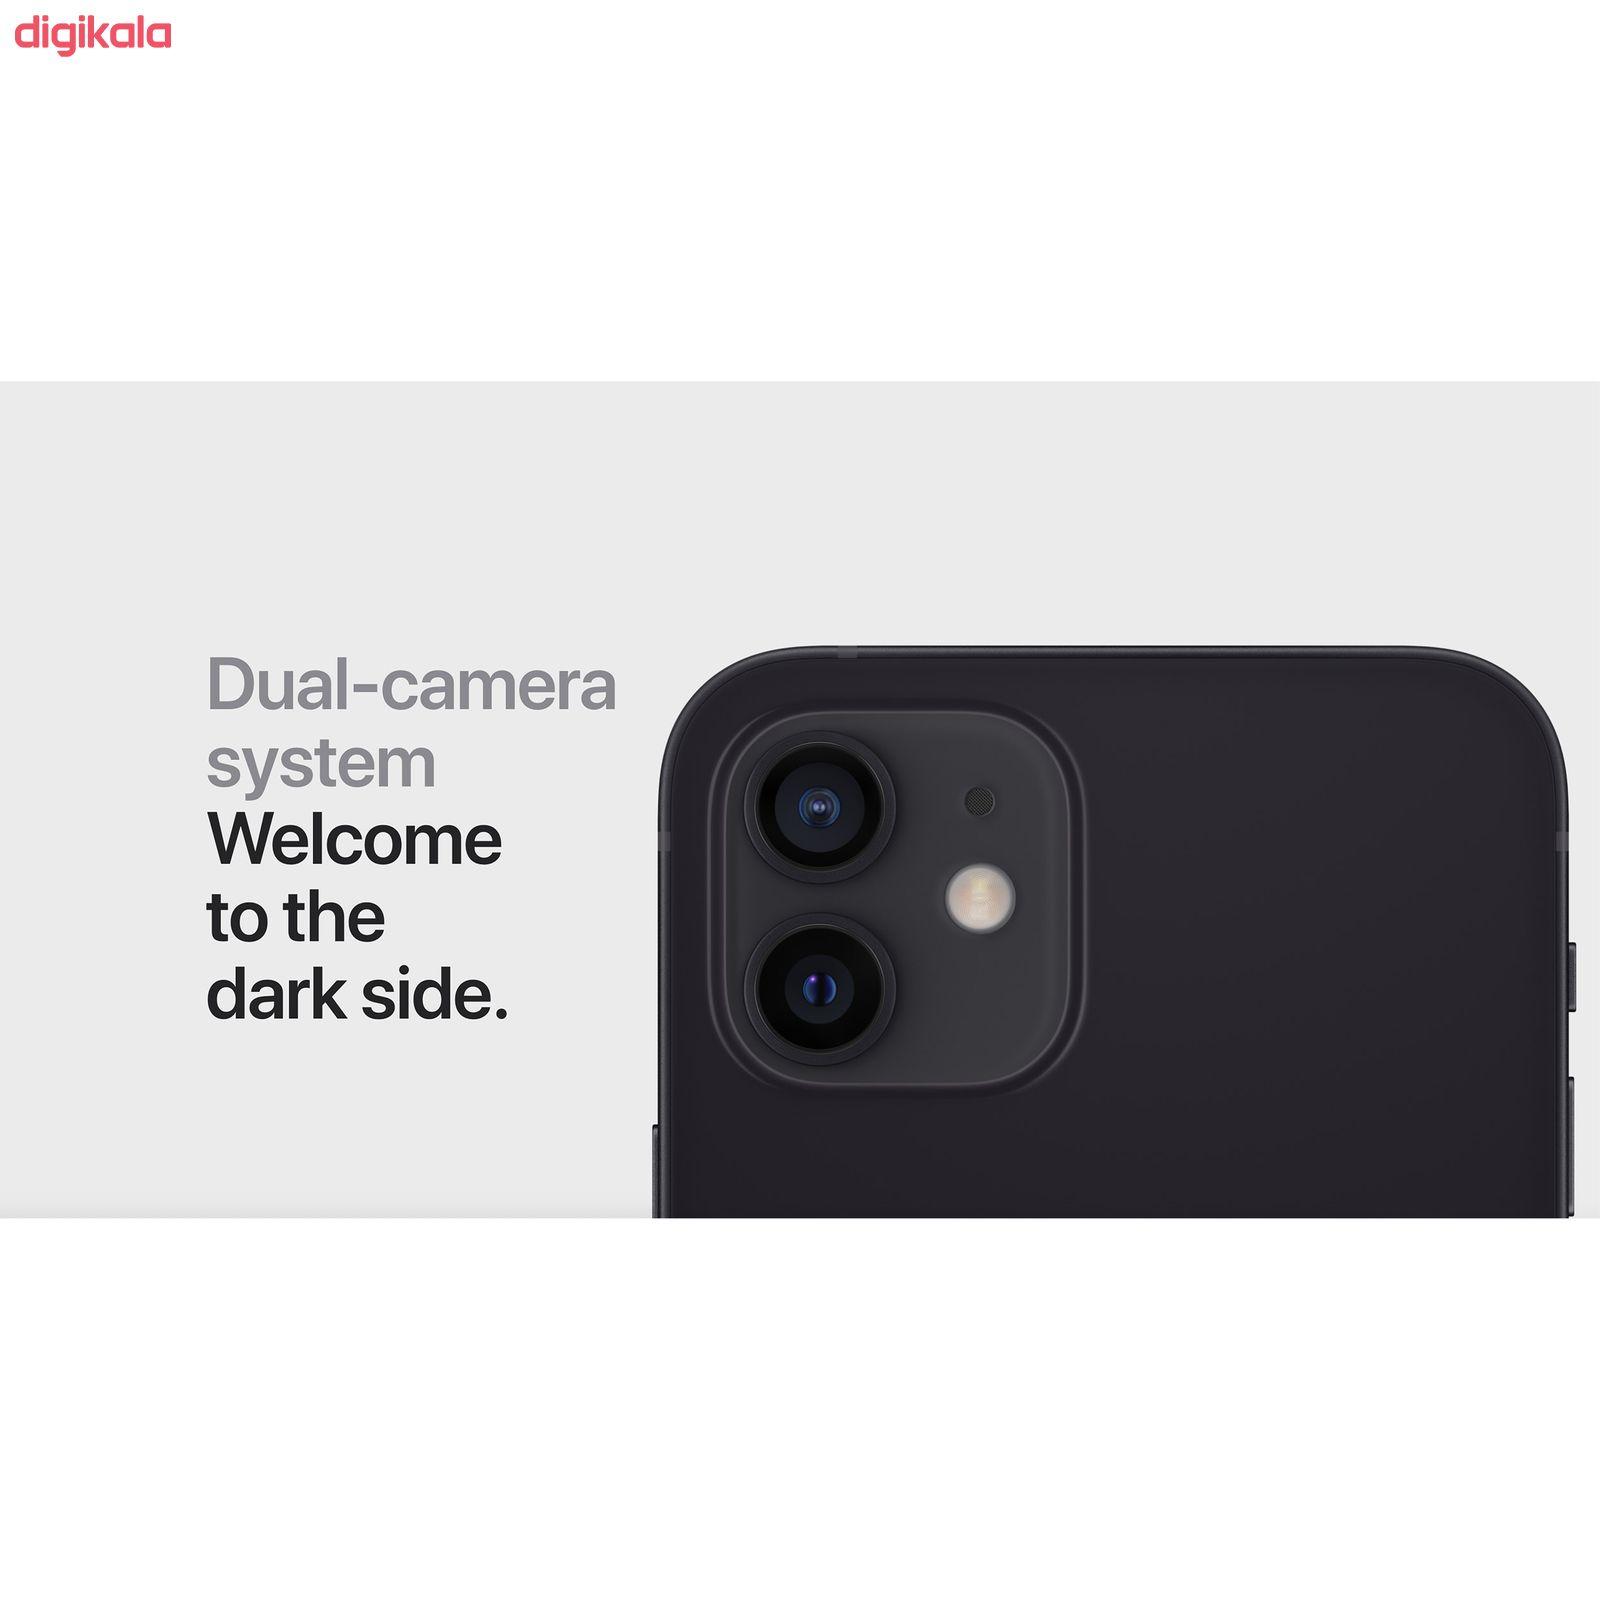 گوشی موبایل اپل مدل iPhone 12 A2404 دو سیم کارت ظرفیت 256 گیگابایت  main 1 5